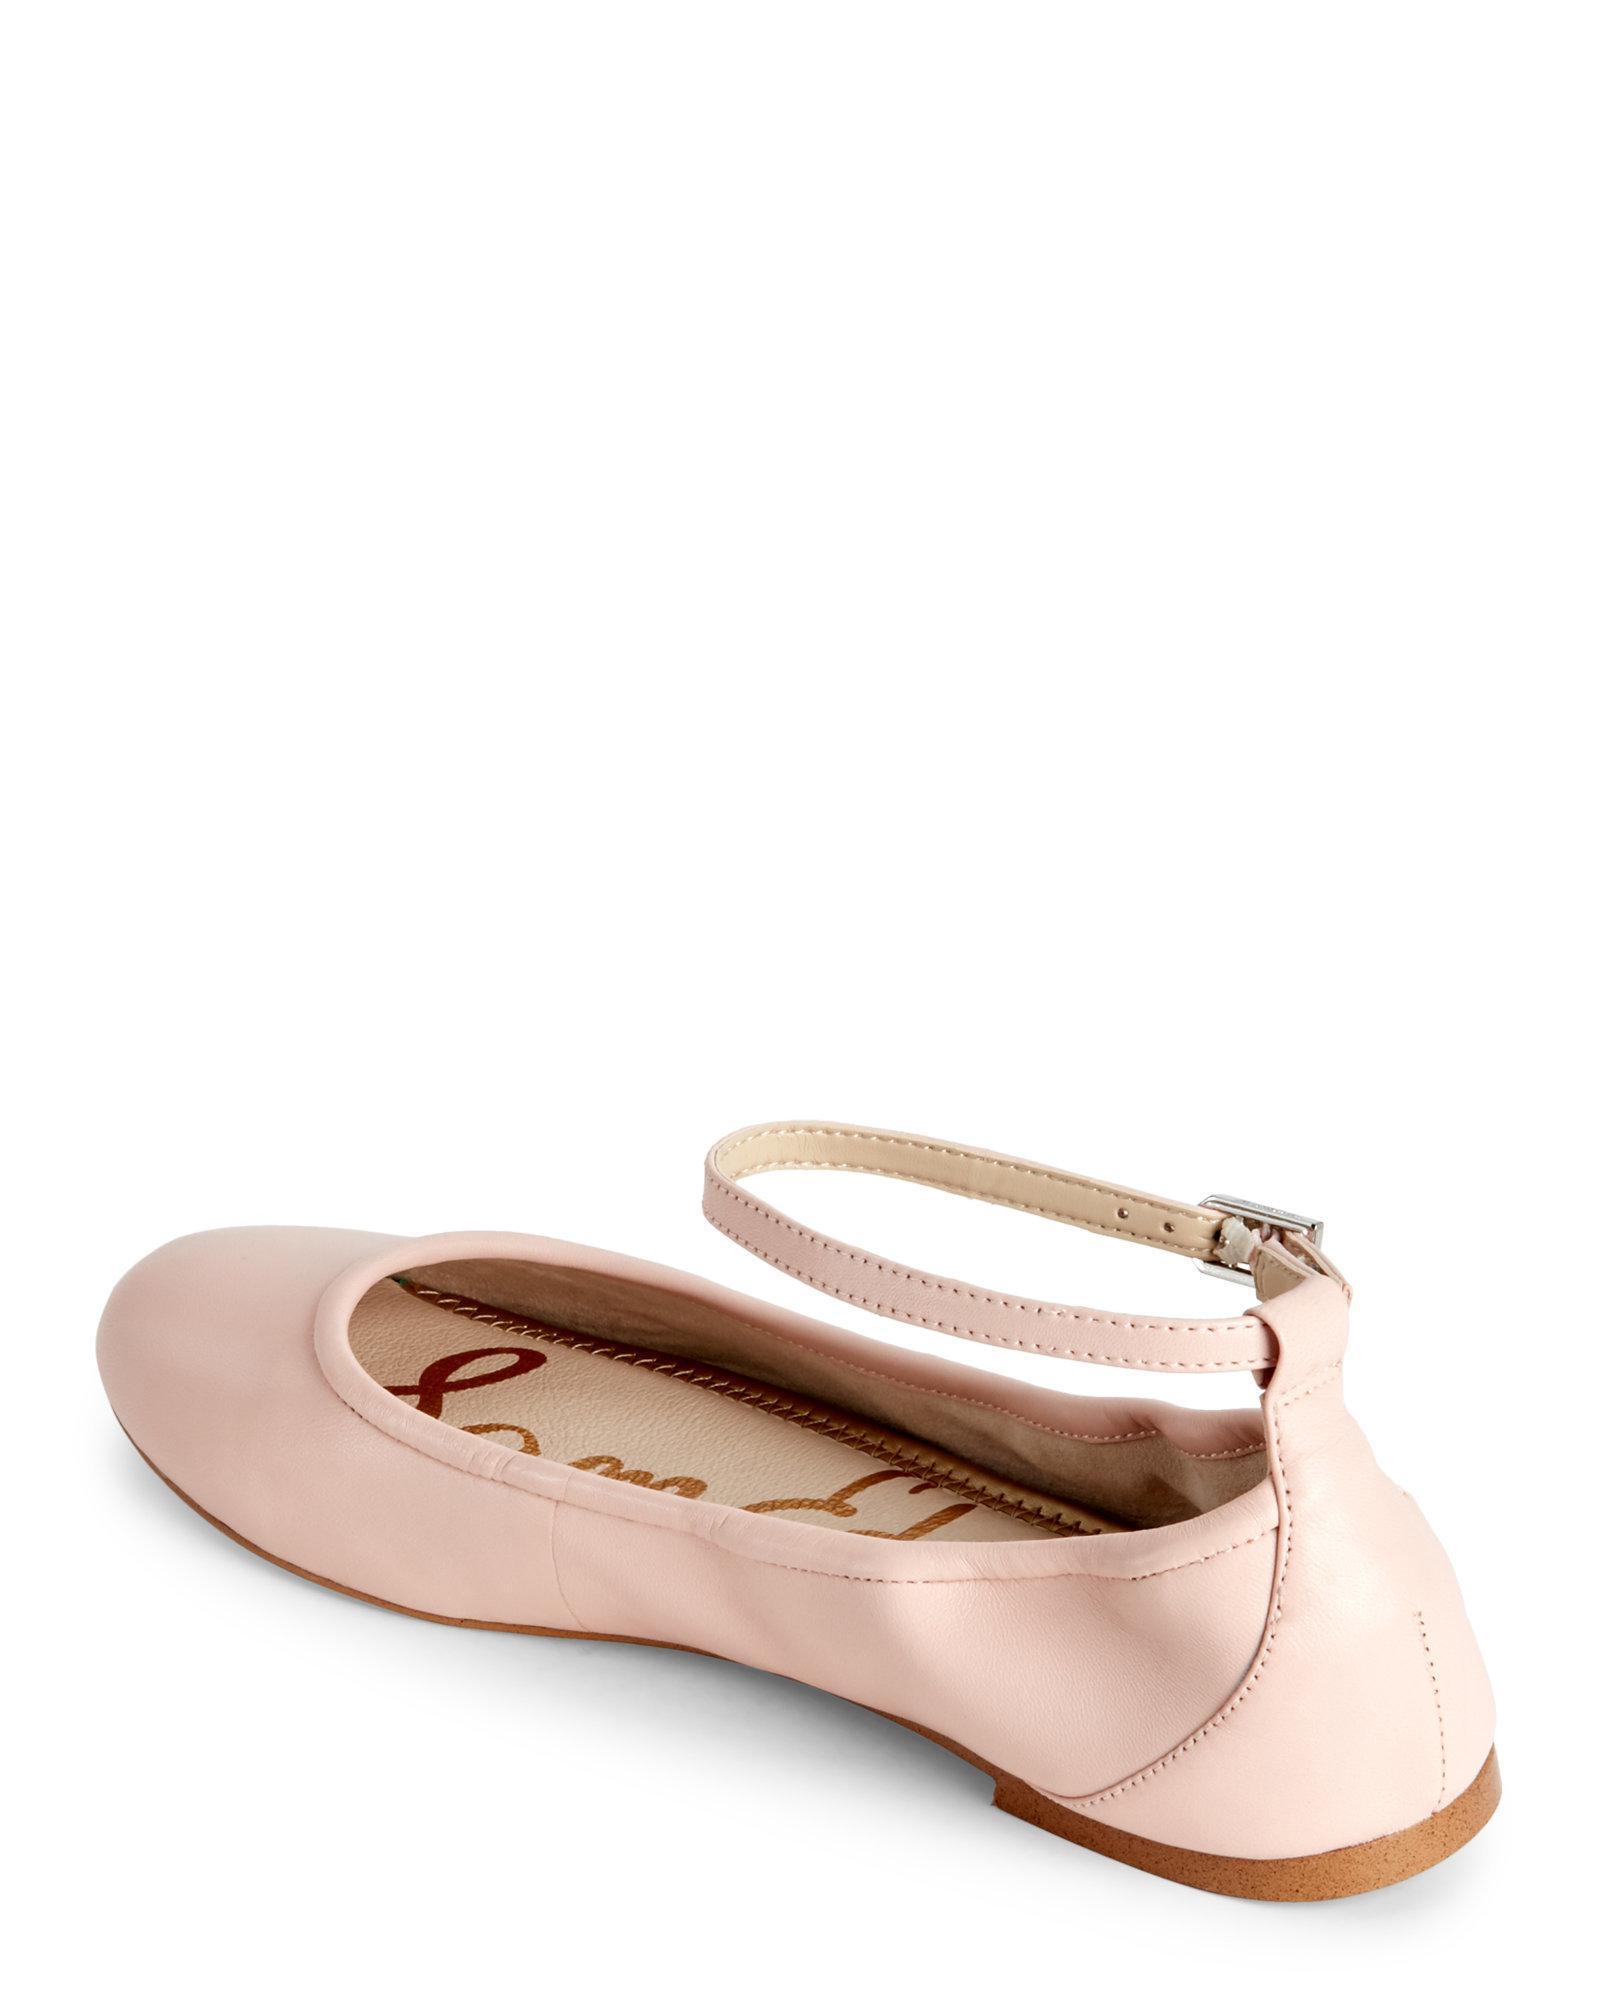 88832dfebd4b Lyst - Sam Edelman Primrose Flynn Ankle Strap Ballet Flats